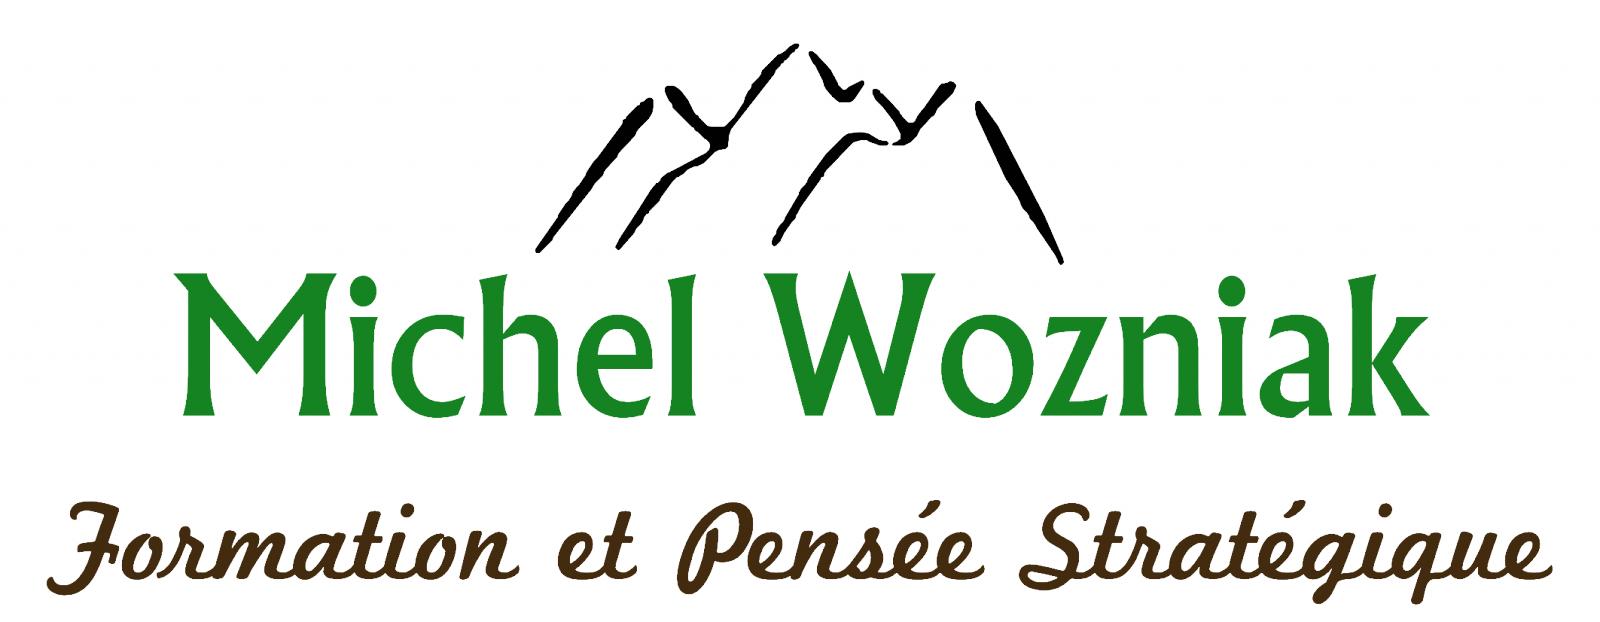 Michel Wozniak